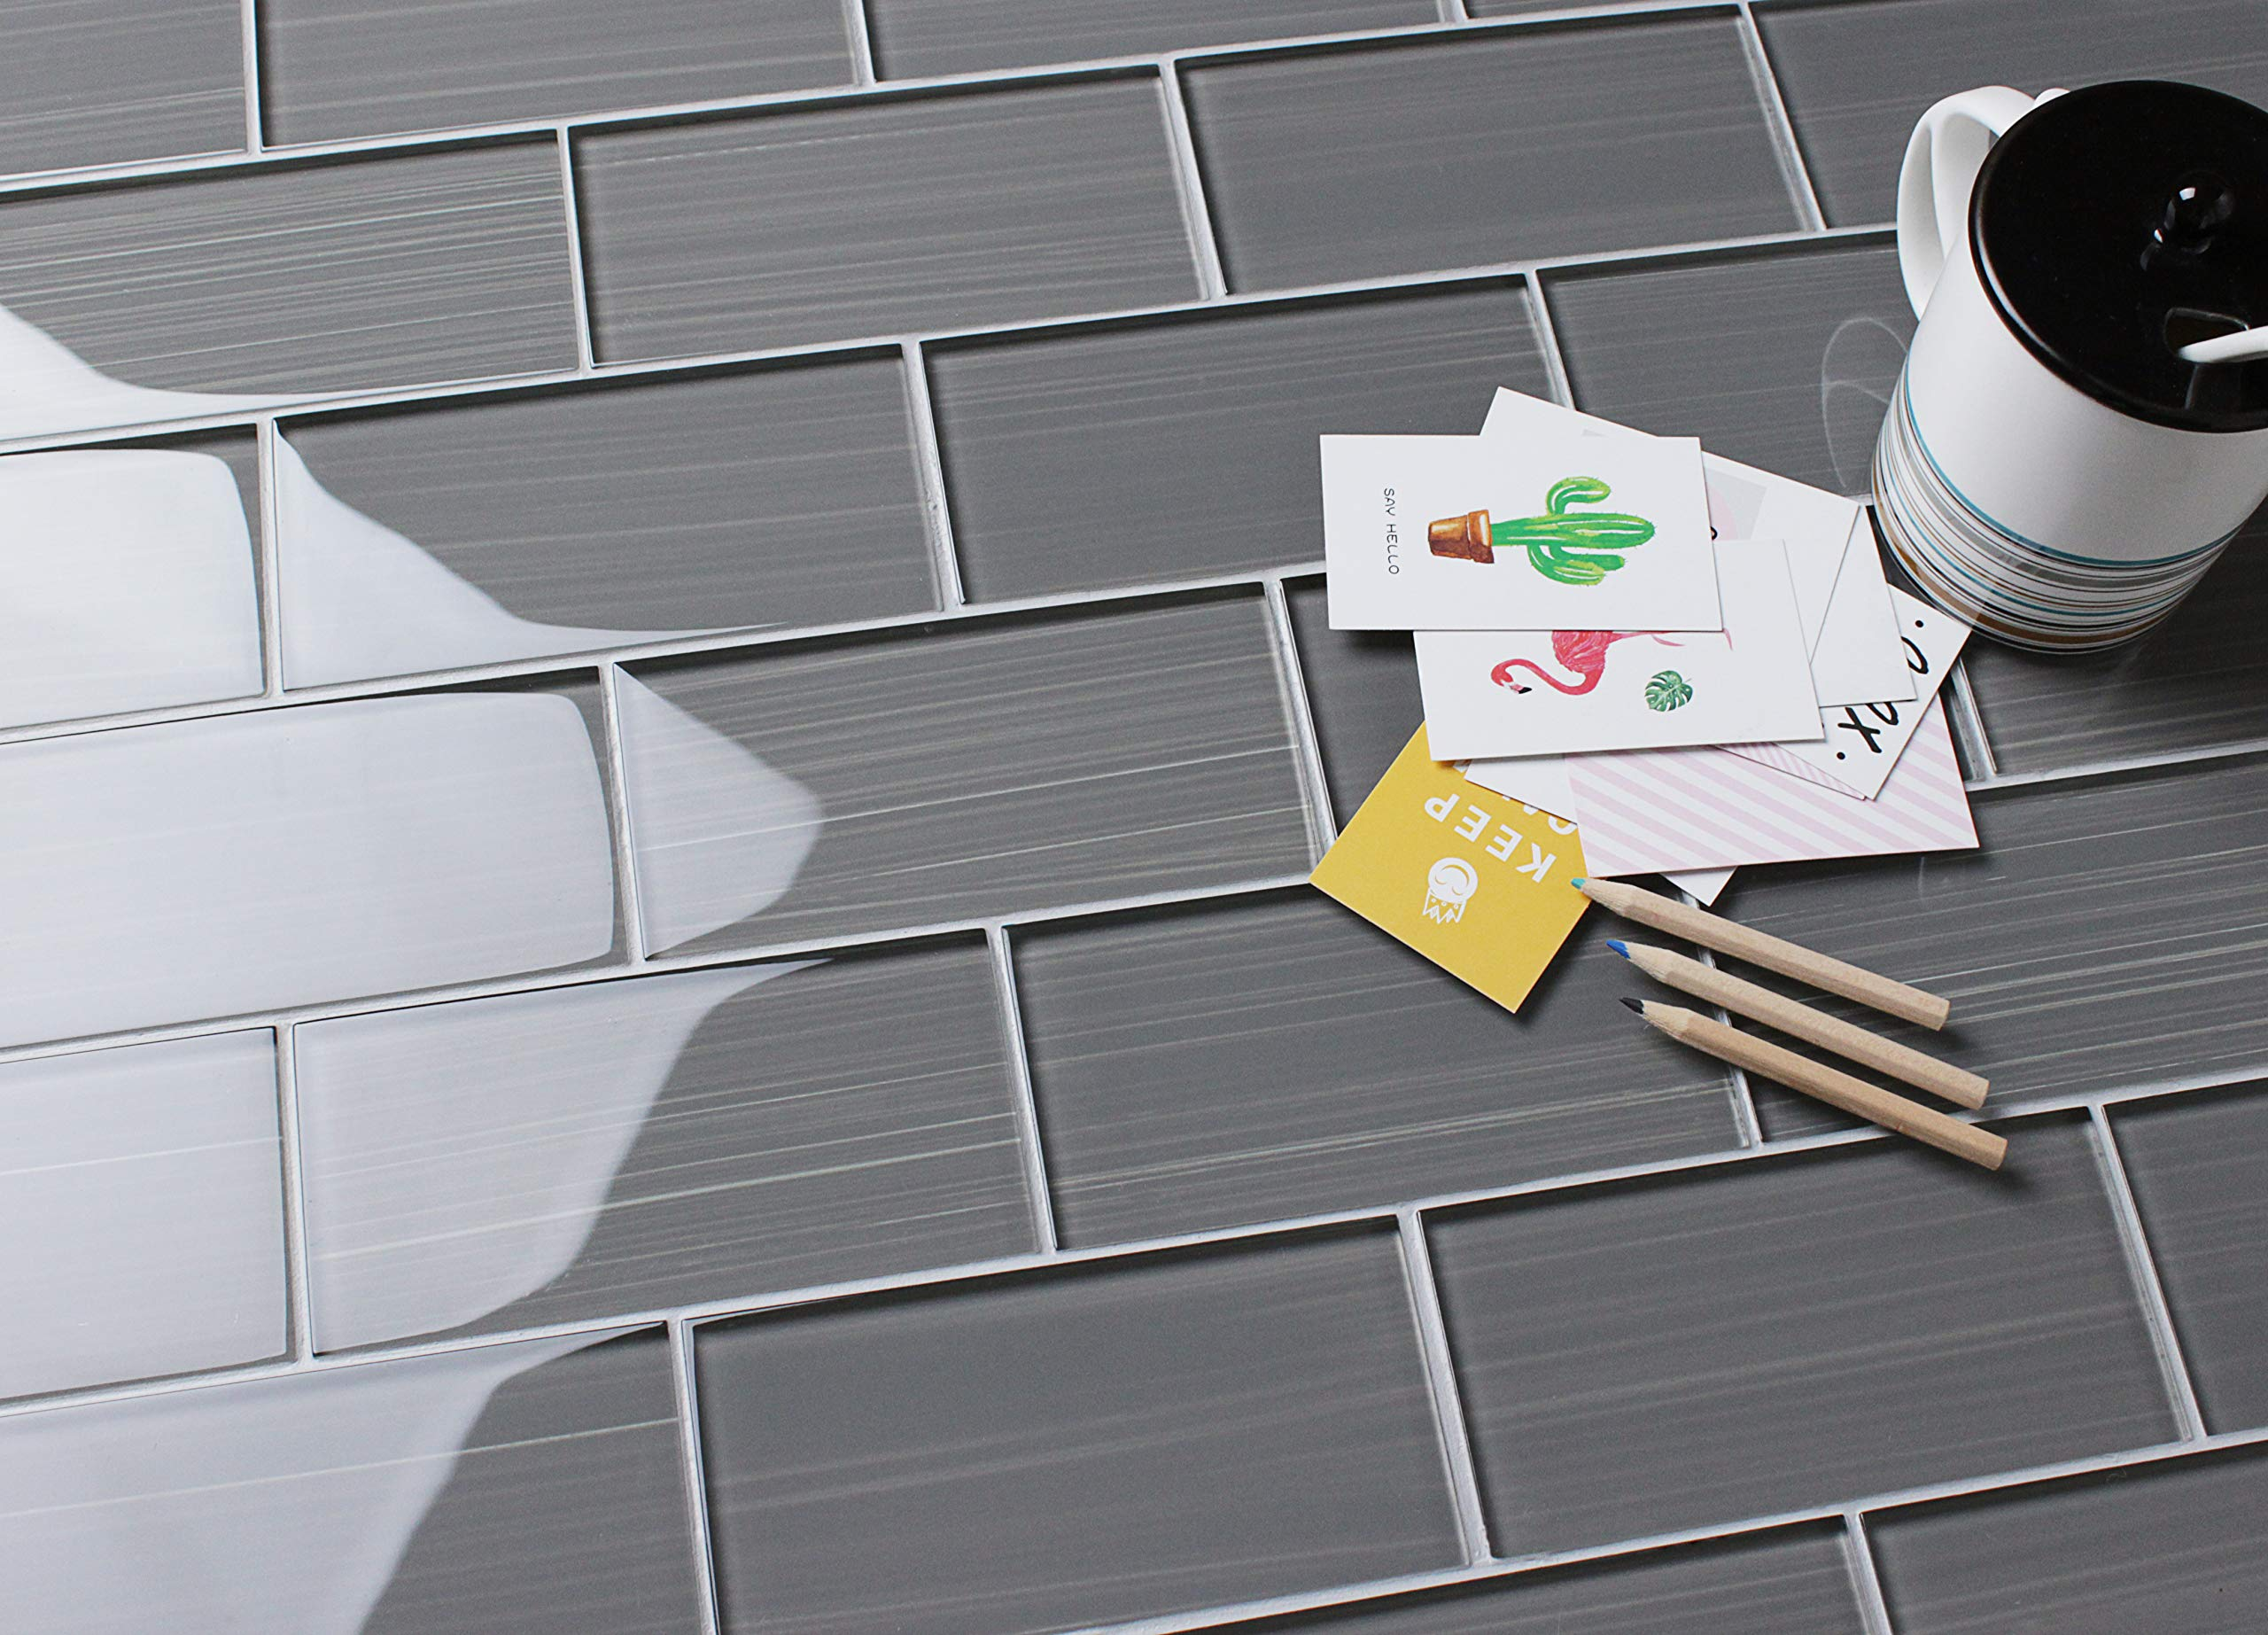 Glass Subway Backsplash Tile Bambu Hand Painted Series for Kitchen and Bathroom by WS Tiles - WST-12C (3'' x 6'' Mosaic 5 SqFt, Dark Gray)